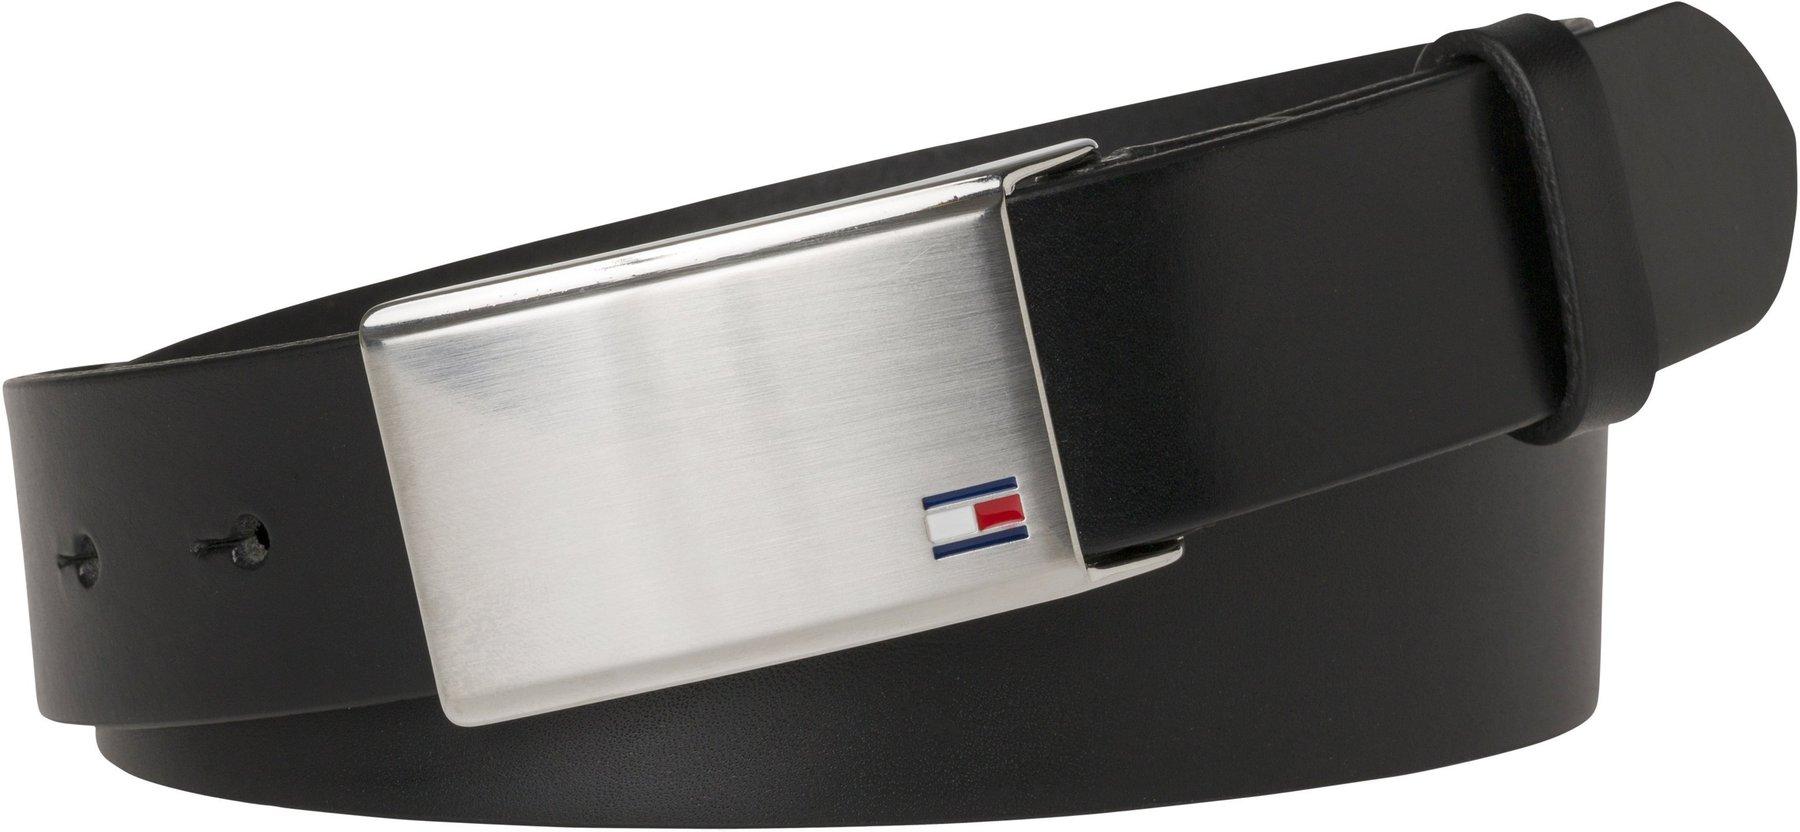 TOMMY HILFIGER New Aly Belt W90 Gürtel Accessoire Midnight Blau Neu